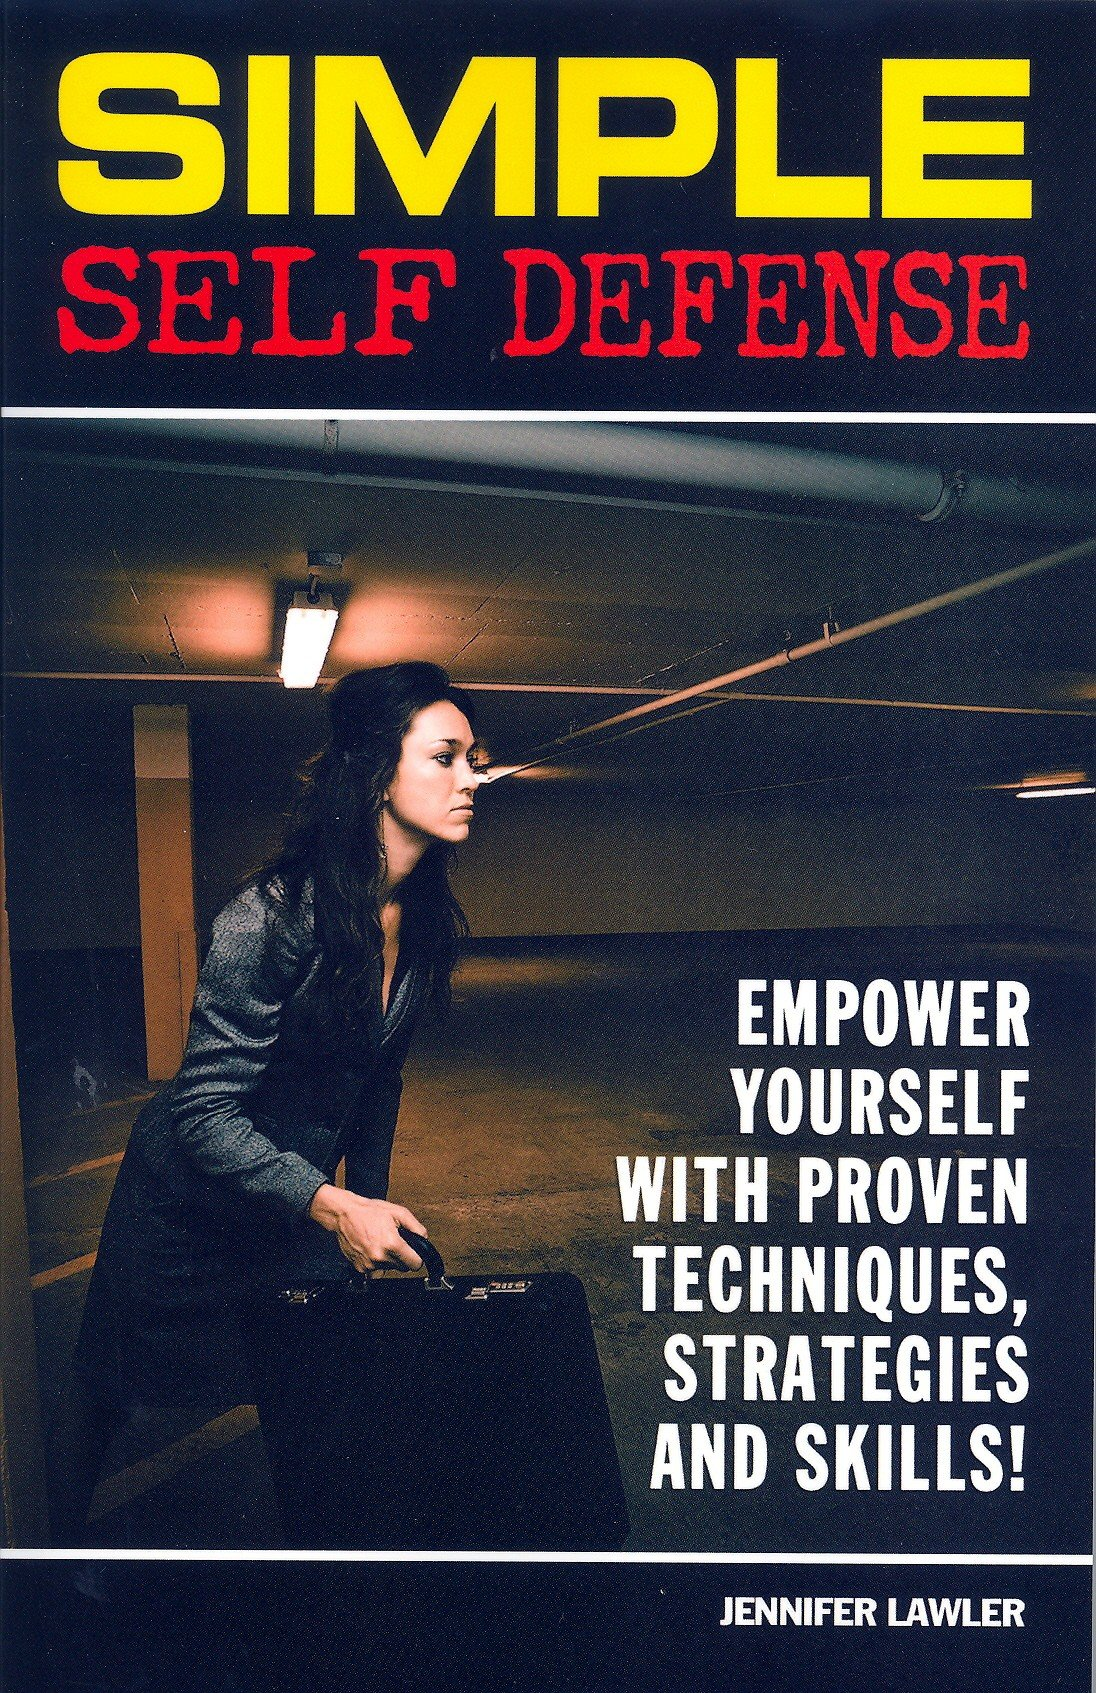 Simple Self Defense: Proven Techniques, Strategies And Skills: Jennifer  Lawler: 9781930546950: Amazon: Books